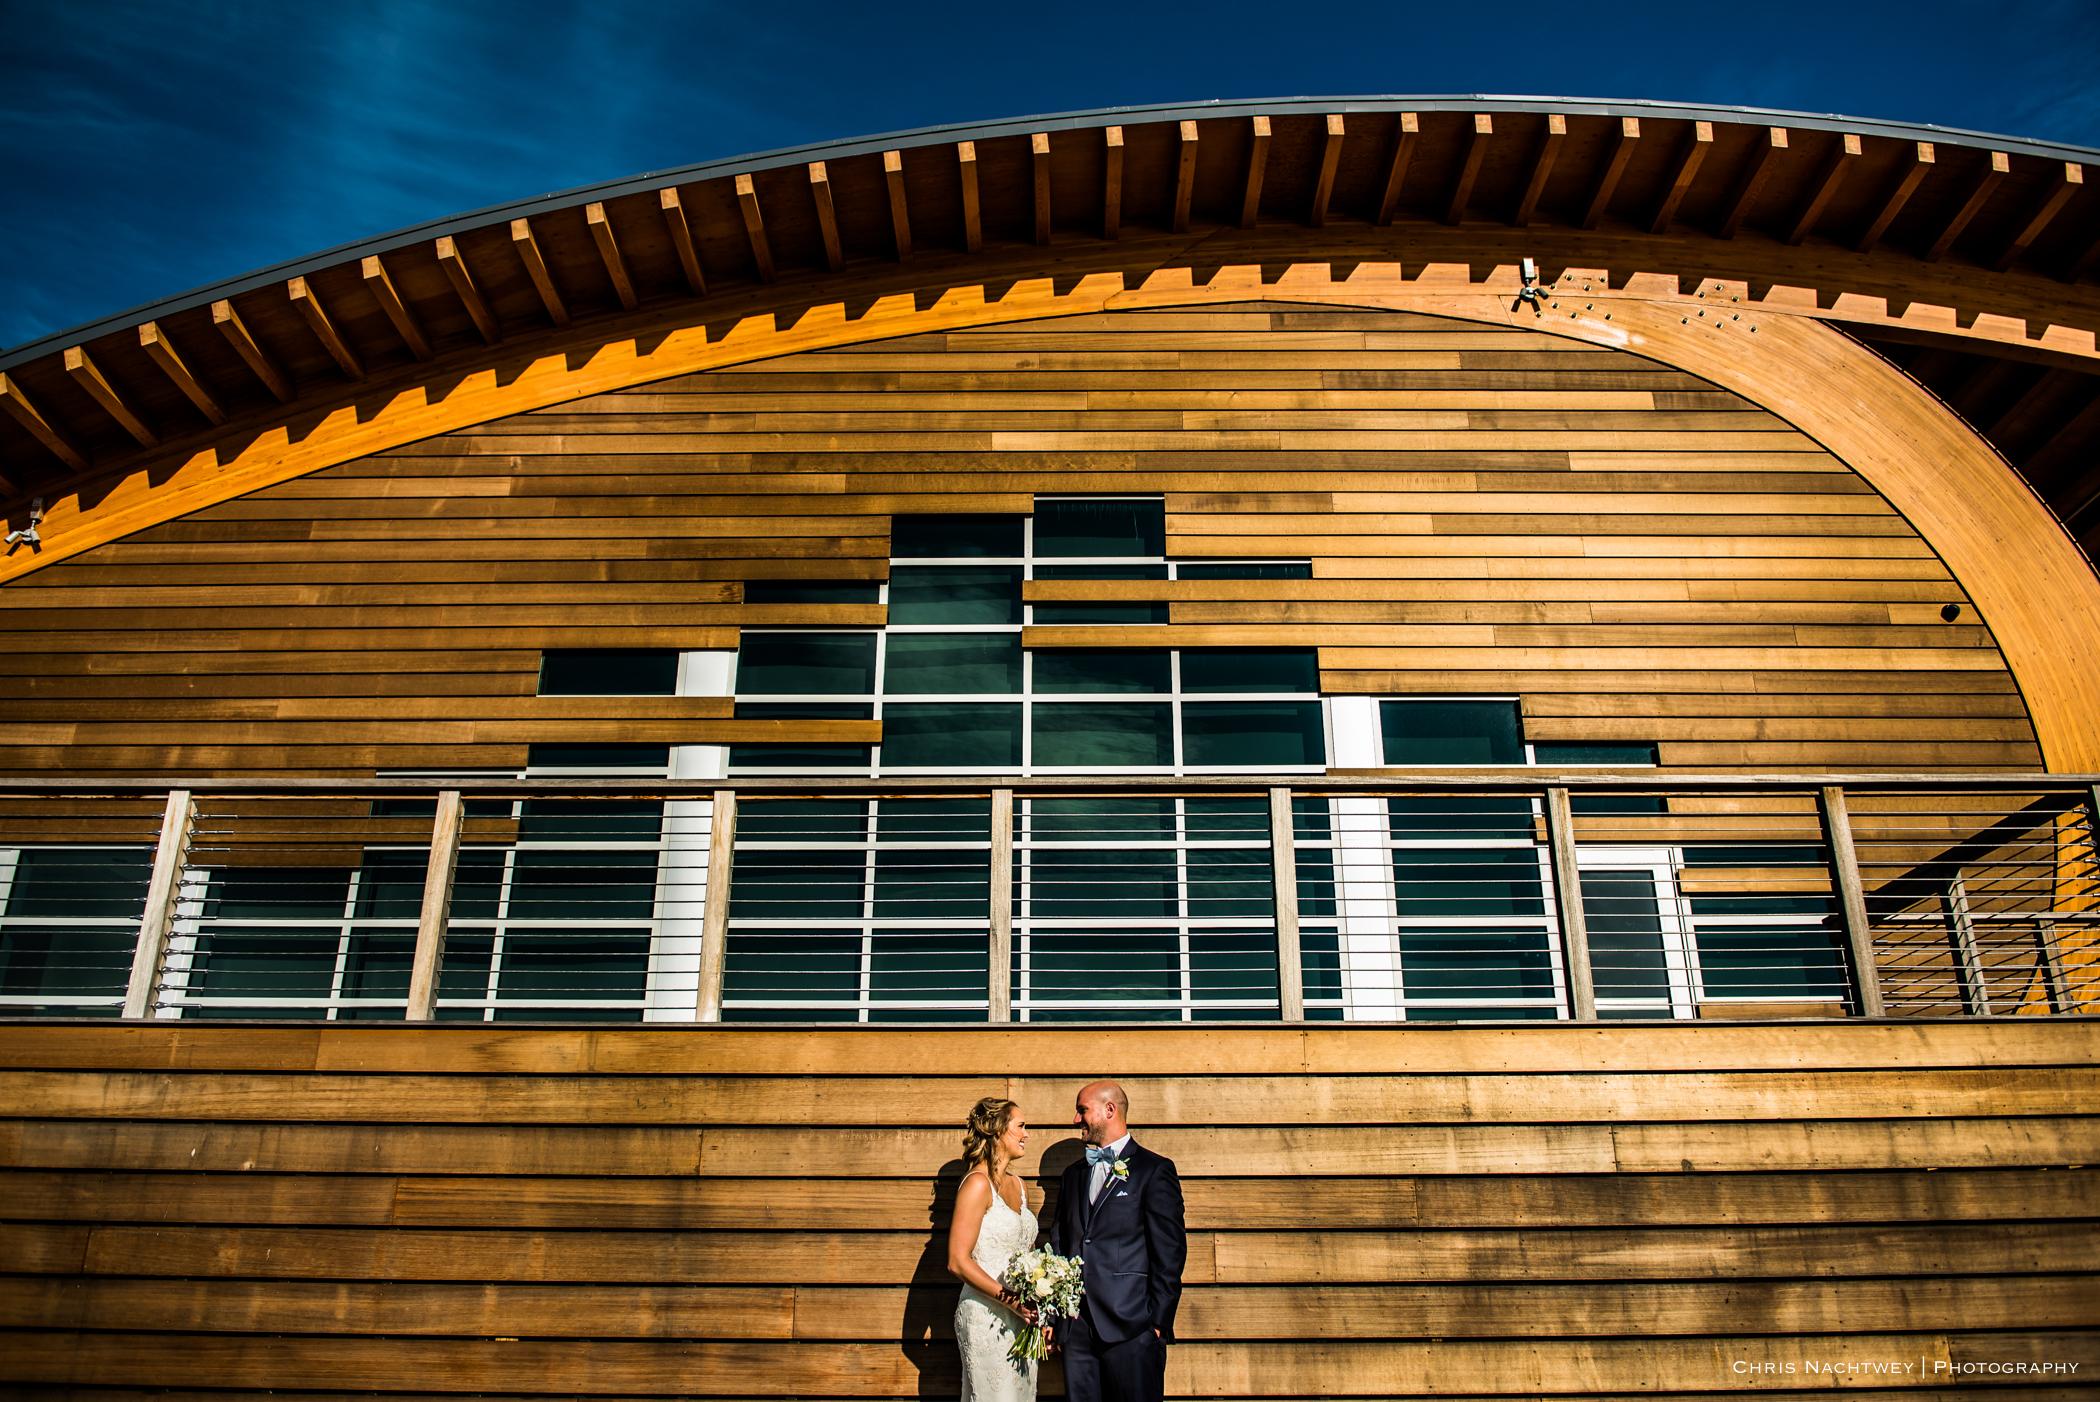 mystic-ct-artistic-wedding-photographers-chris-nachtwey-tany-mike-2017-26.jpg